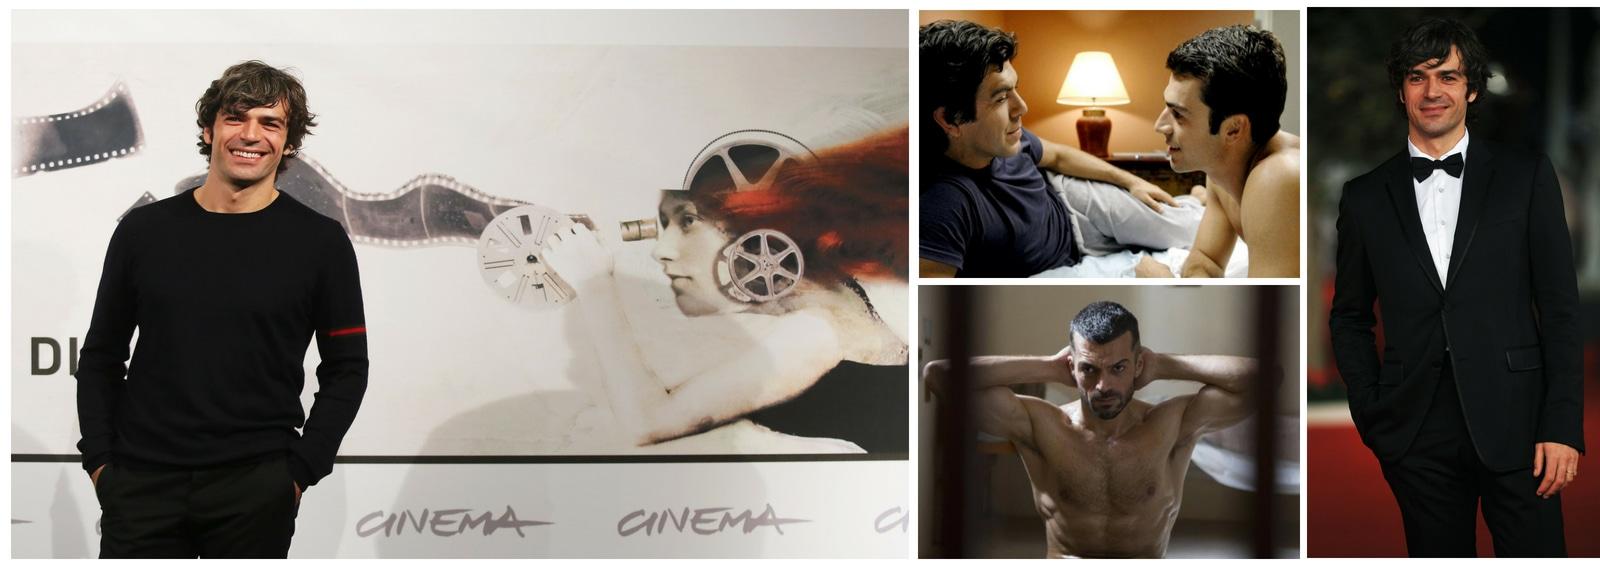 Luca Argentero sexsymbol attore italiano film amori curiosita vita DESK